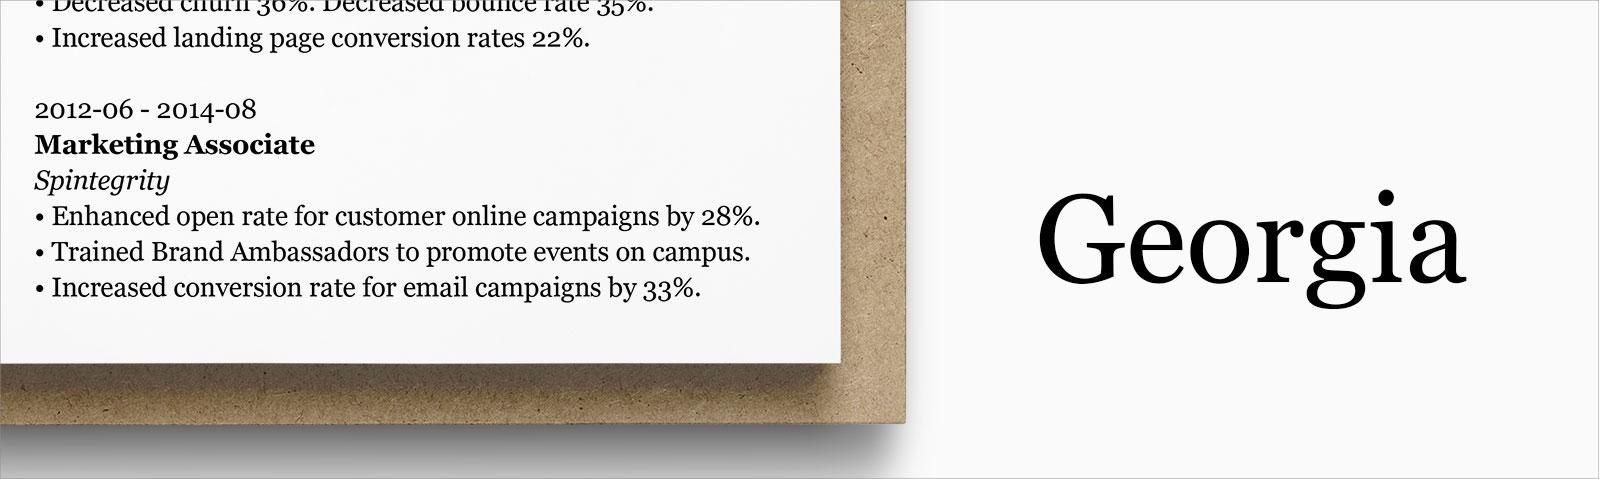 Letter Size Resume Fonts Resume Format Infographic Resume